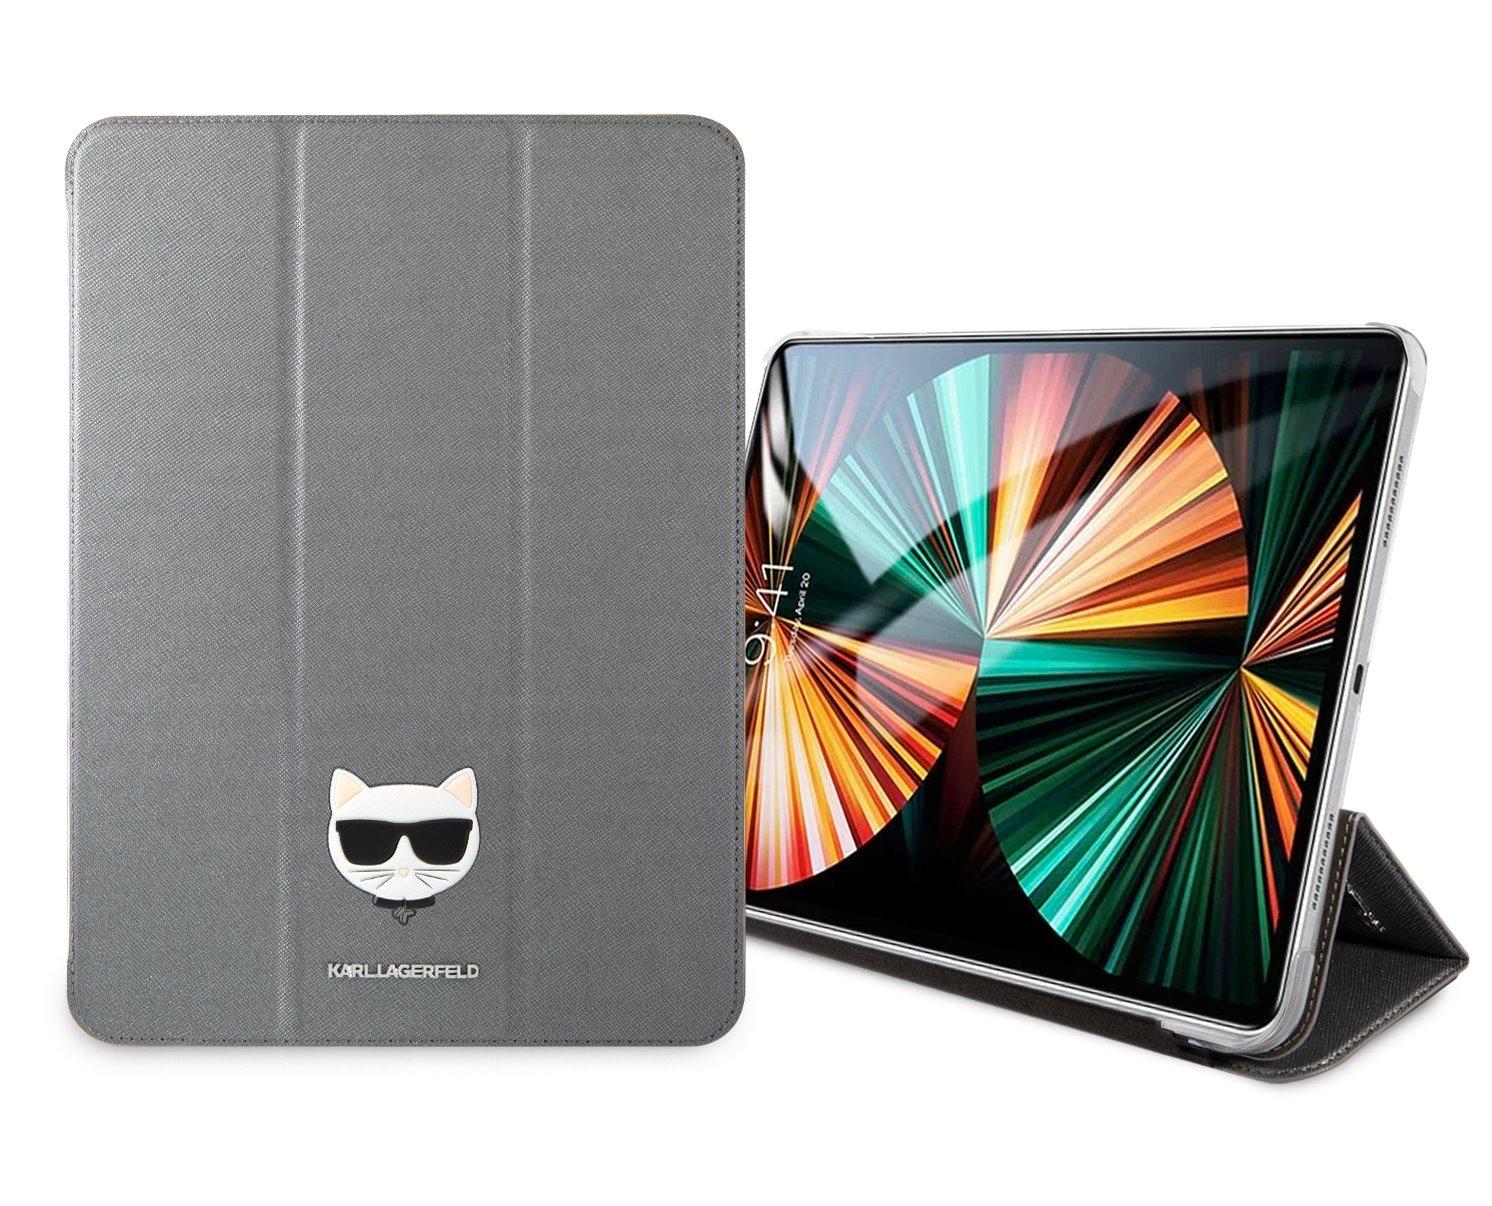 Pouzdro na tablet Karl Lagerfeld Head Saffiano KLFC12OKHG pro Apple iPad Pro 12.9, stříbrná